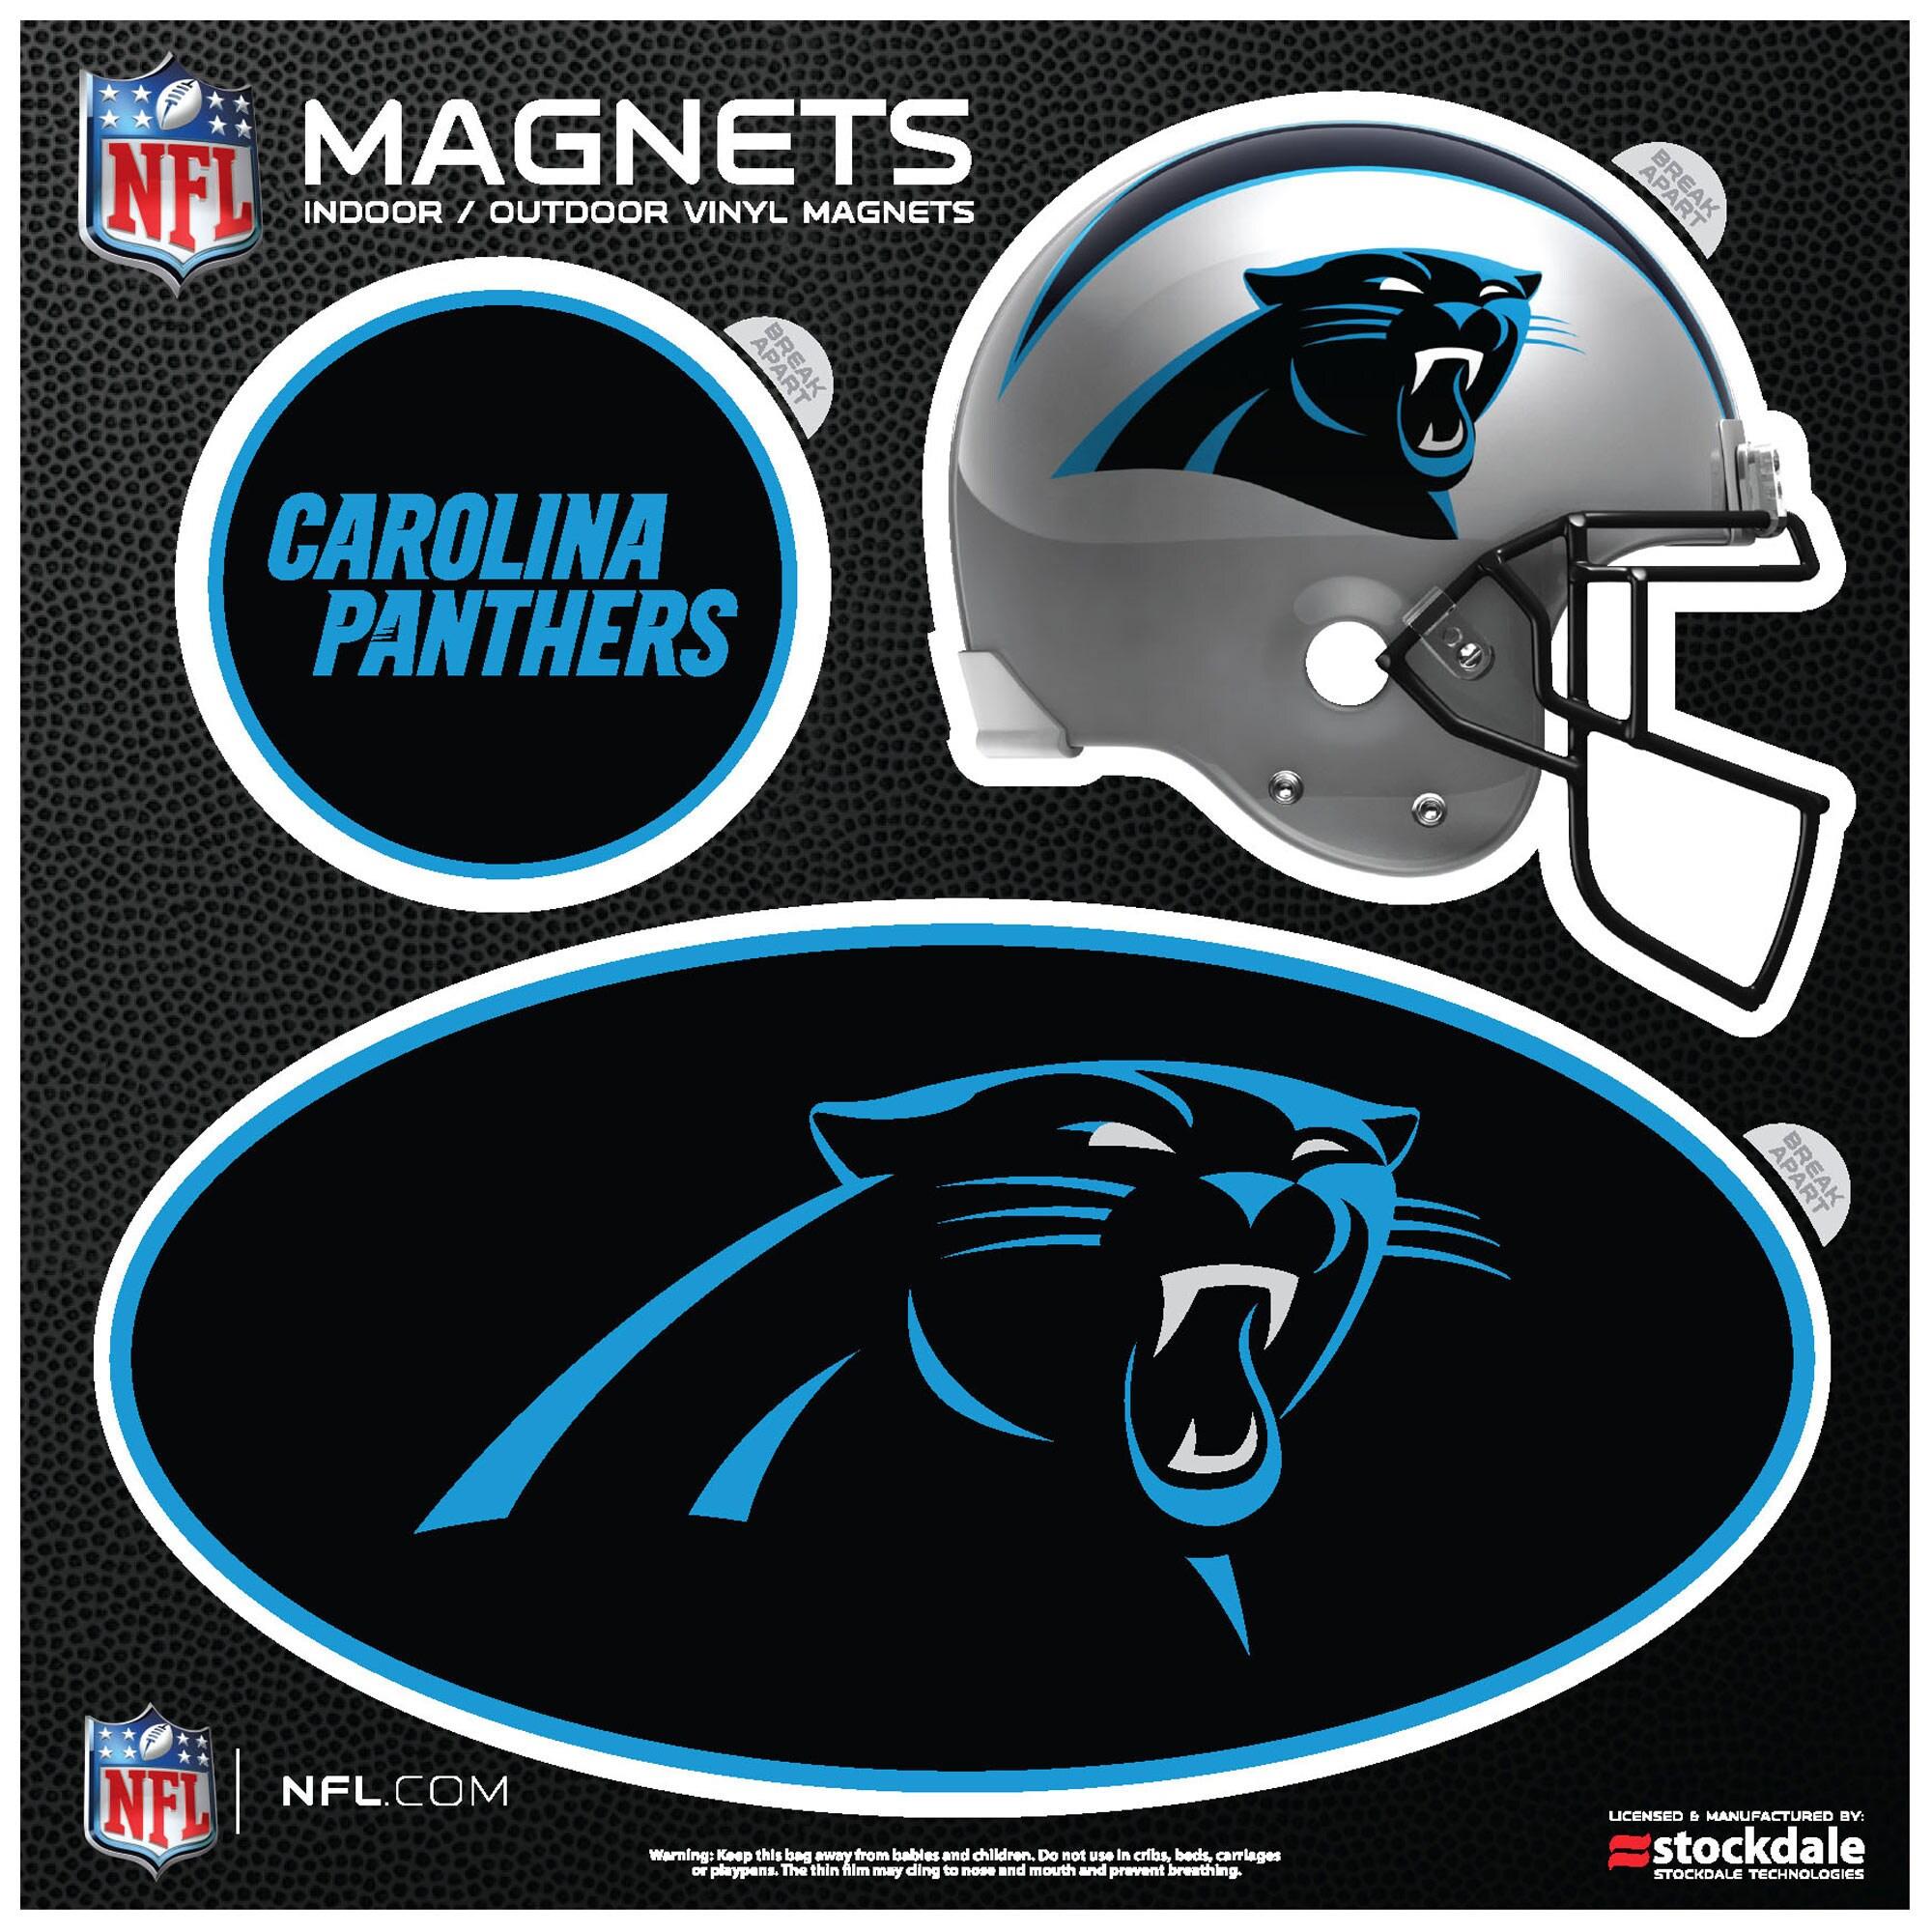 Carolina Panthers Indoor & Outdoor 3-Pack Magnet Set